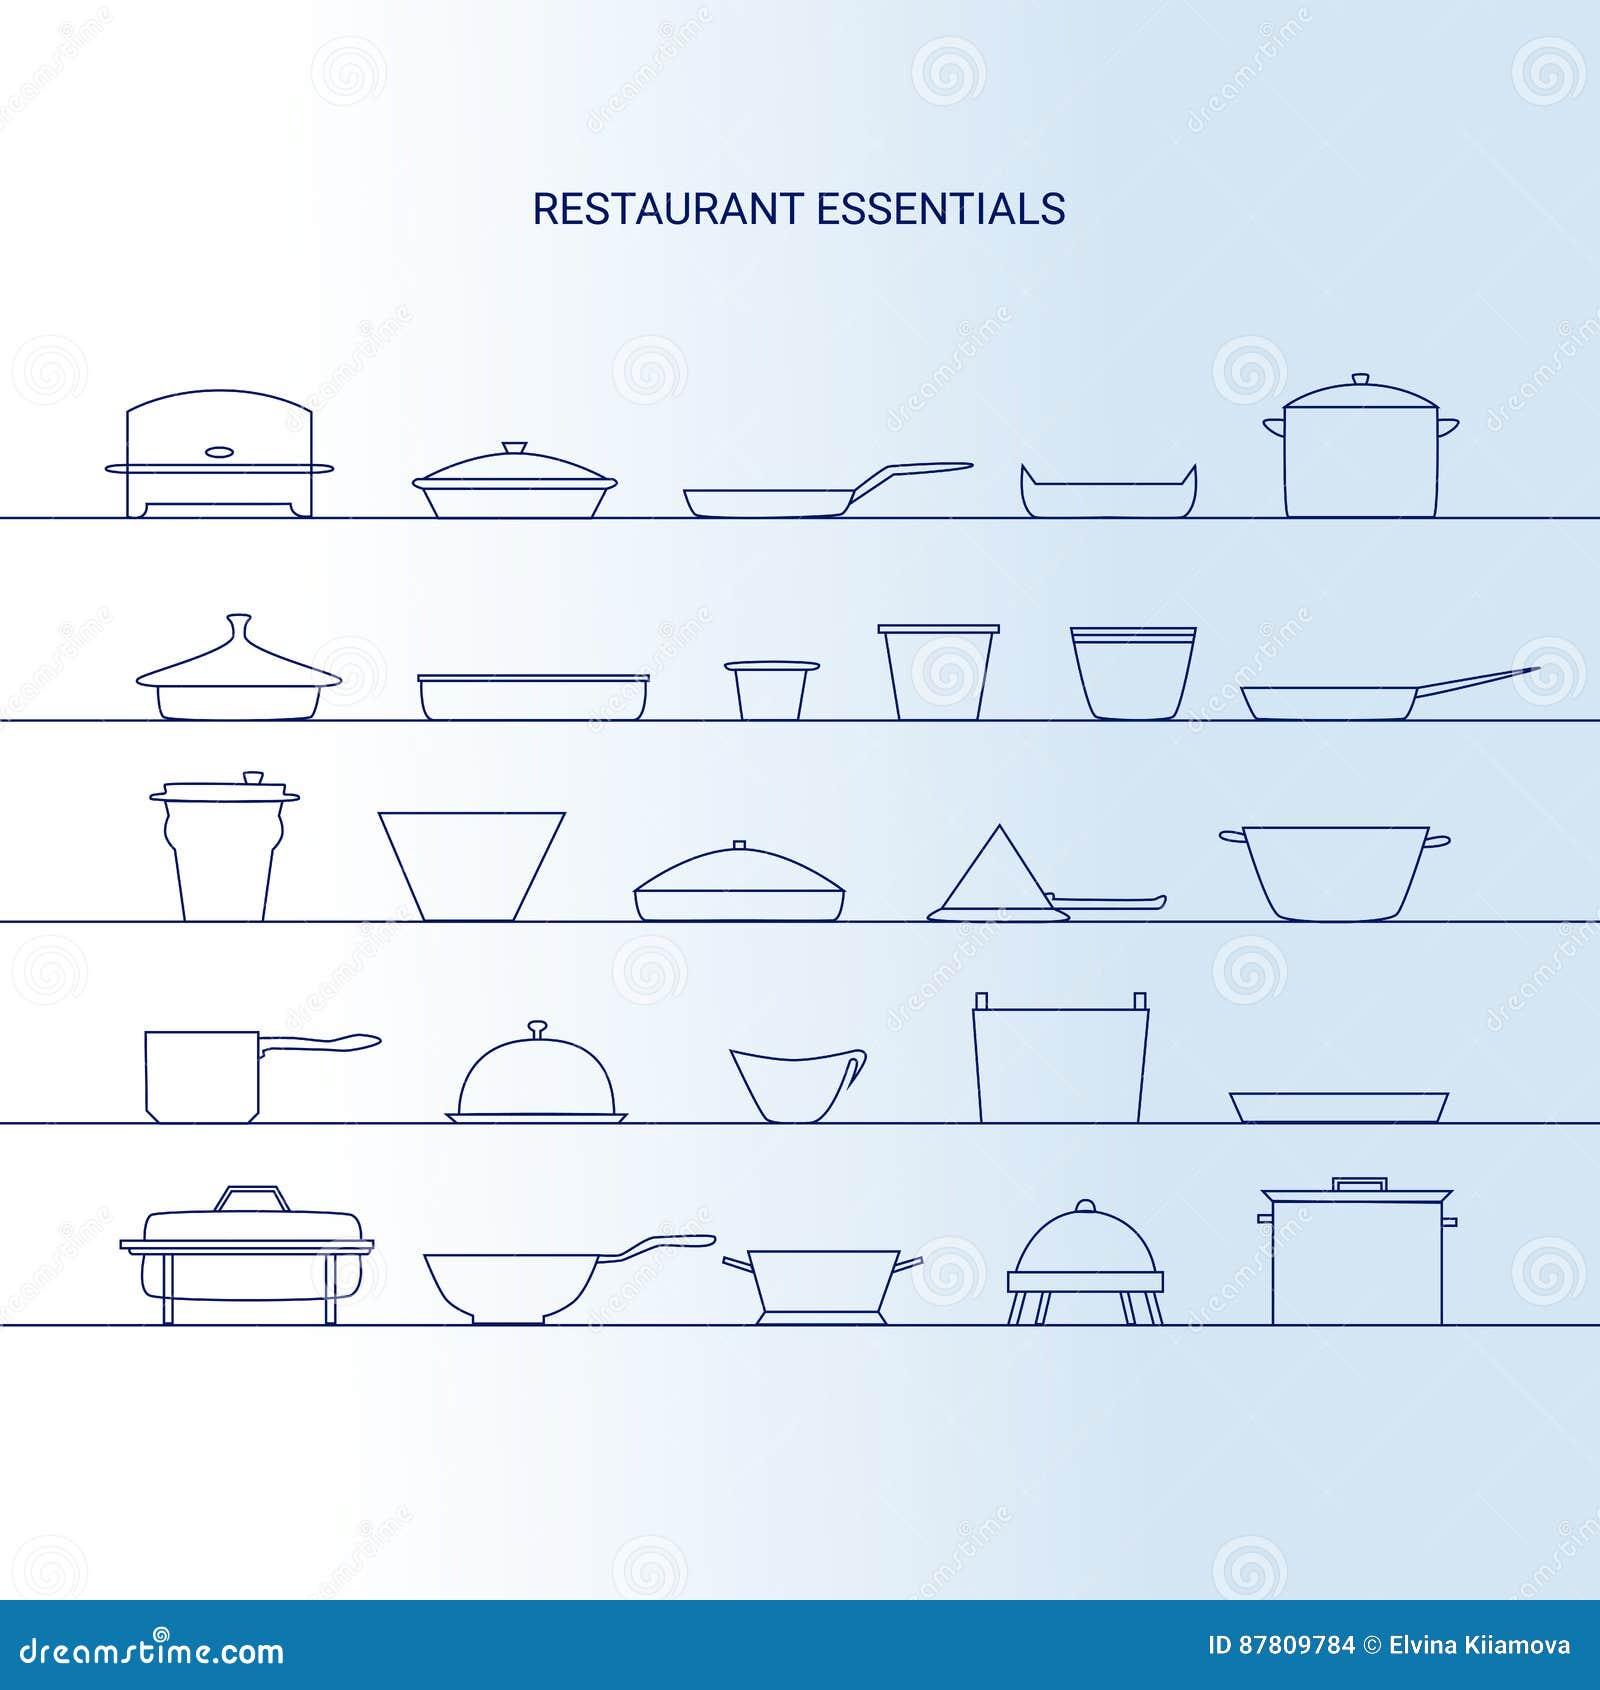 Restaurant essentials icon set